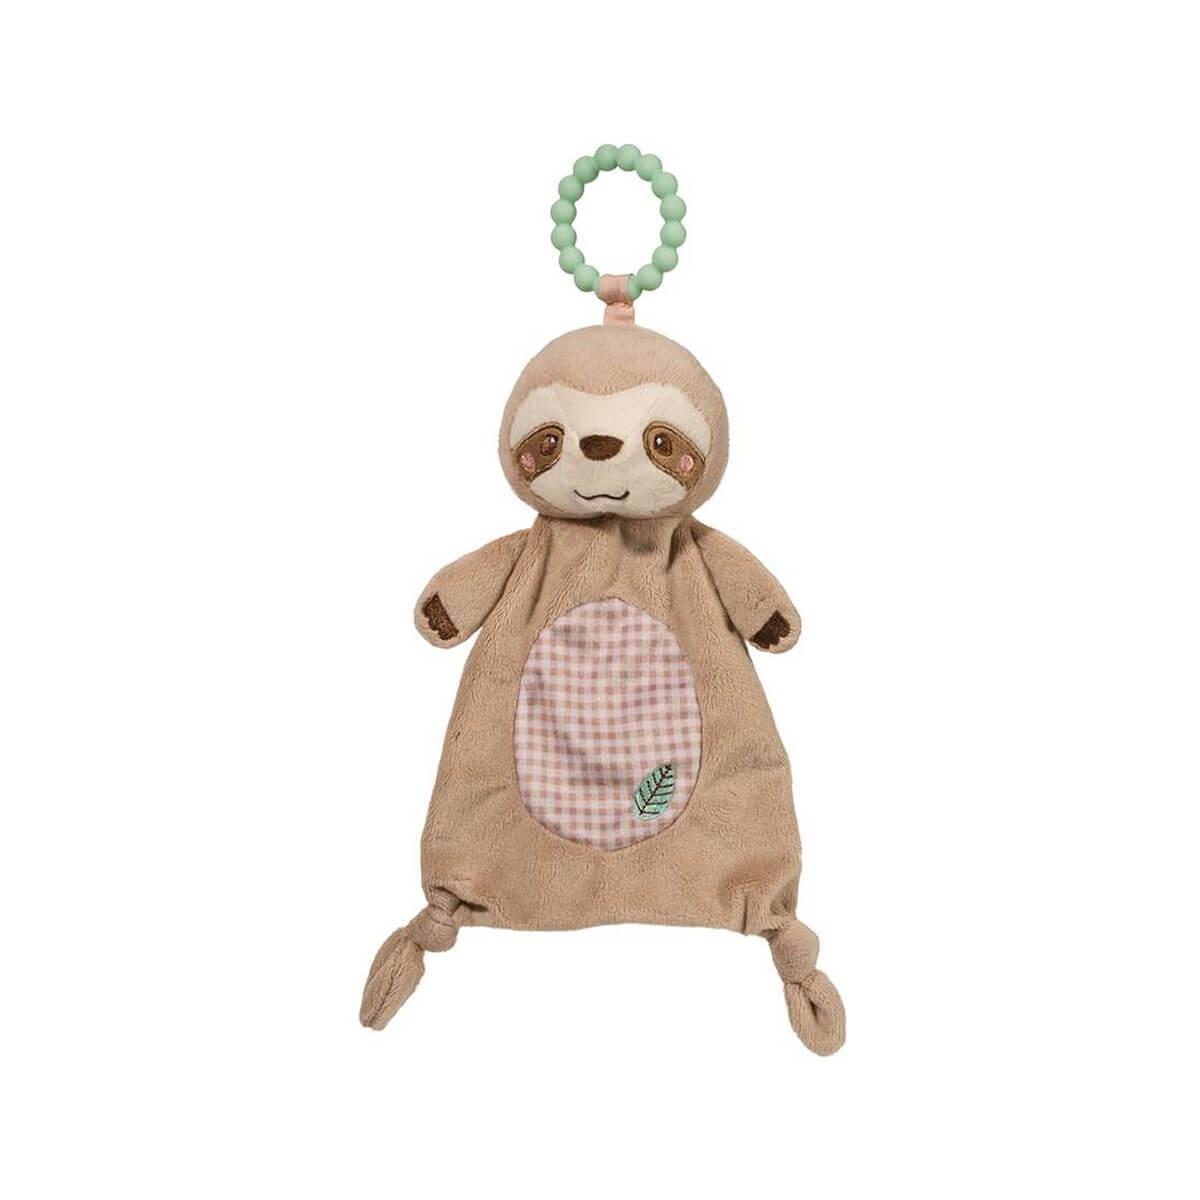 Plush Sloth Teether